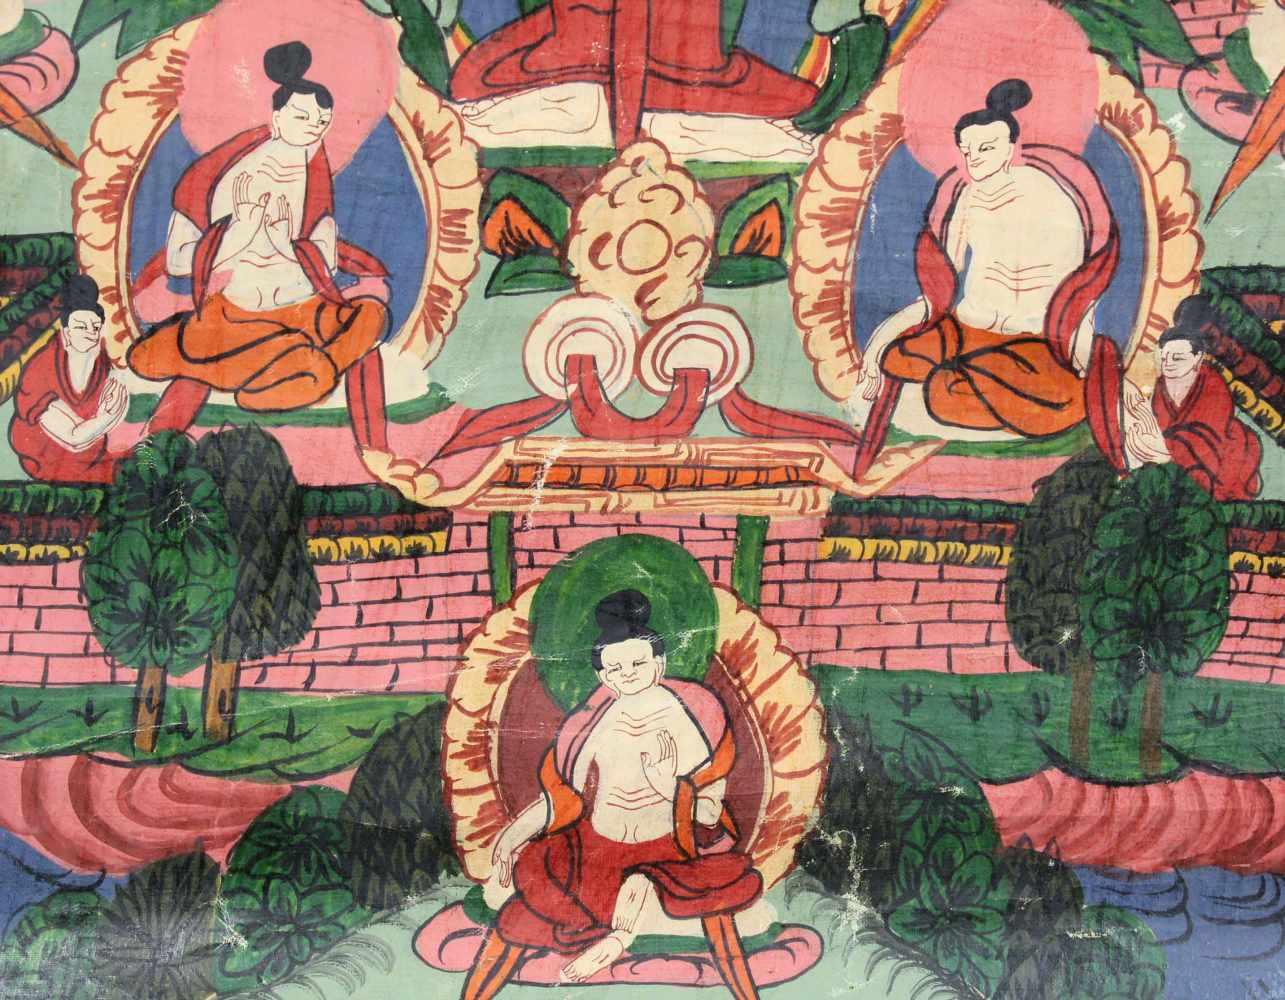 Lot 22 - Avalokiteshavara Thangka, China / Tibet alt.60 cm x 42 cm. Gemälde.Avalokiteshavara Thangka, China /